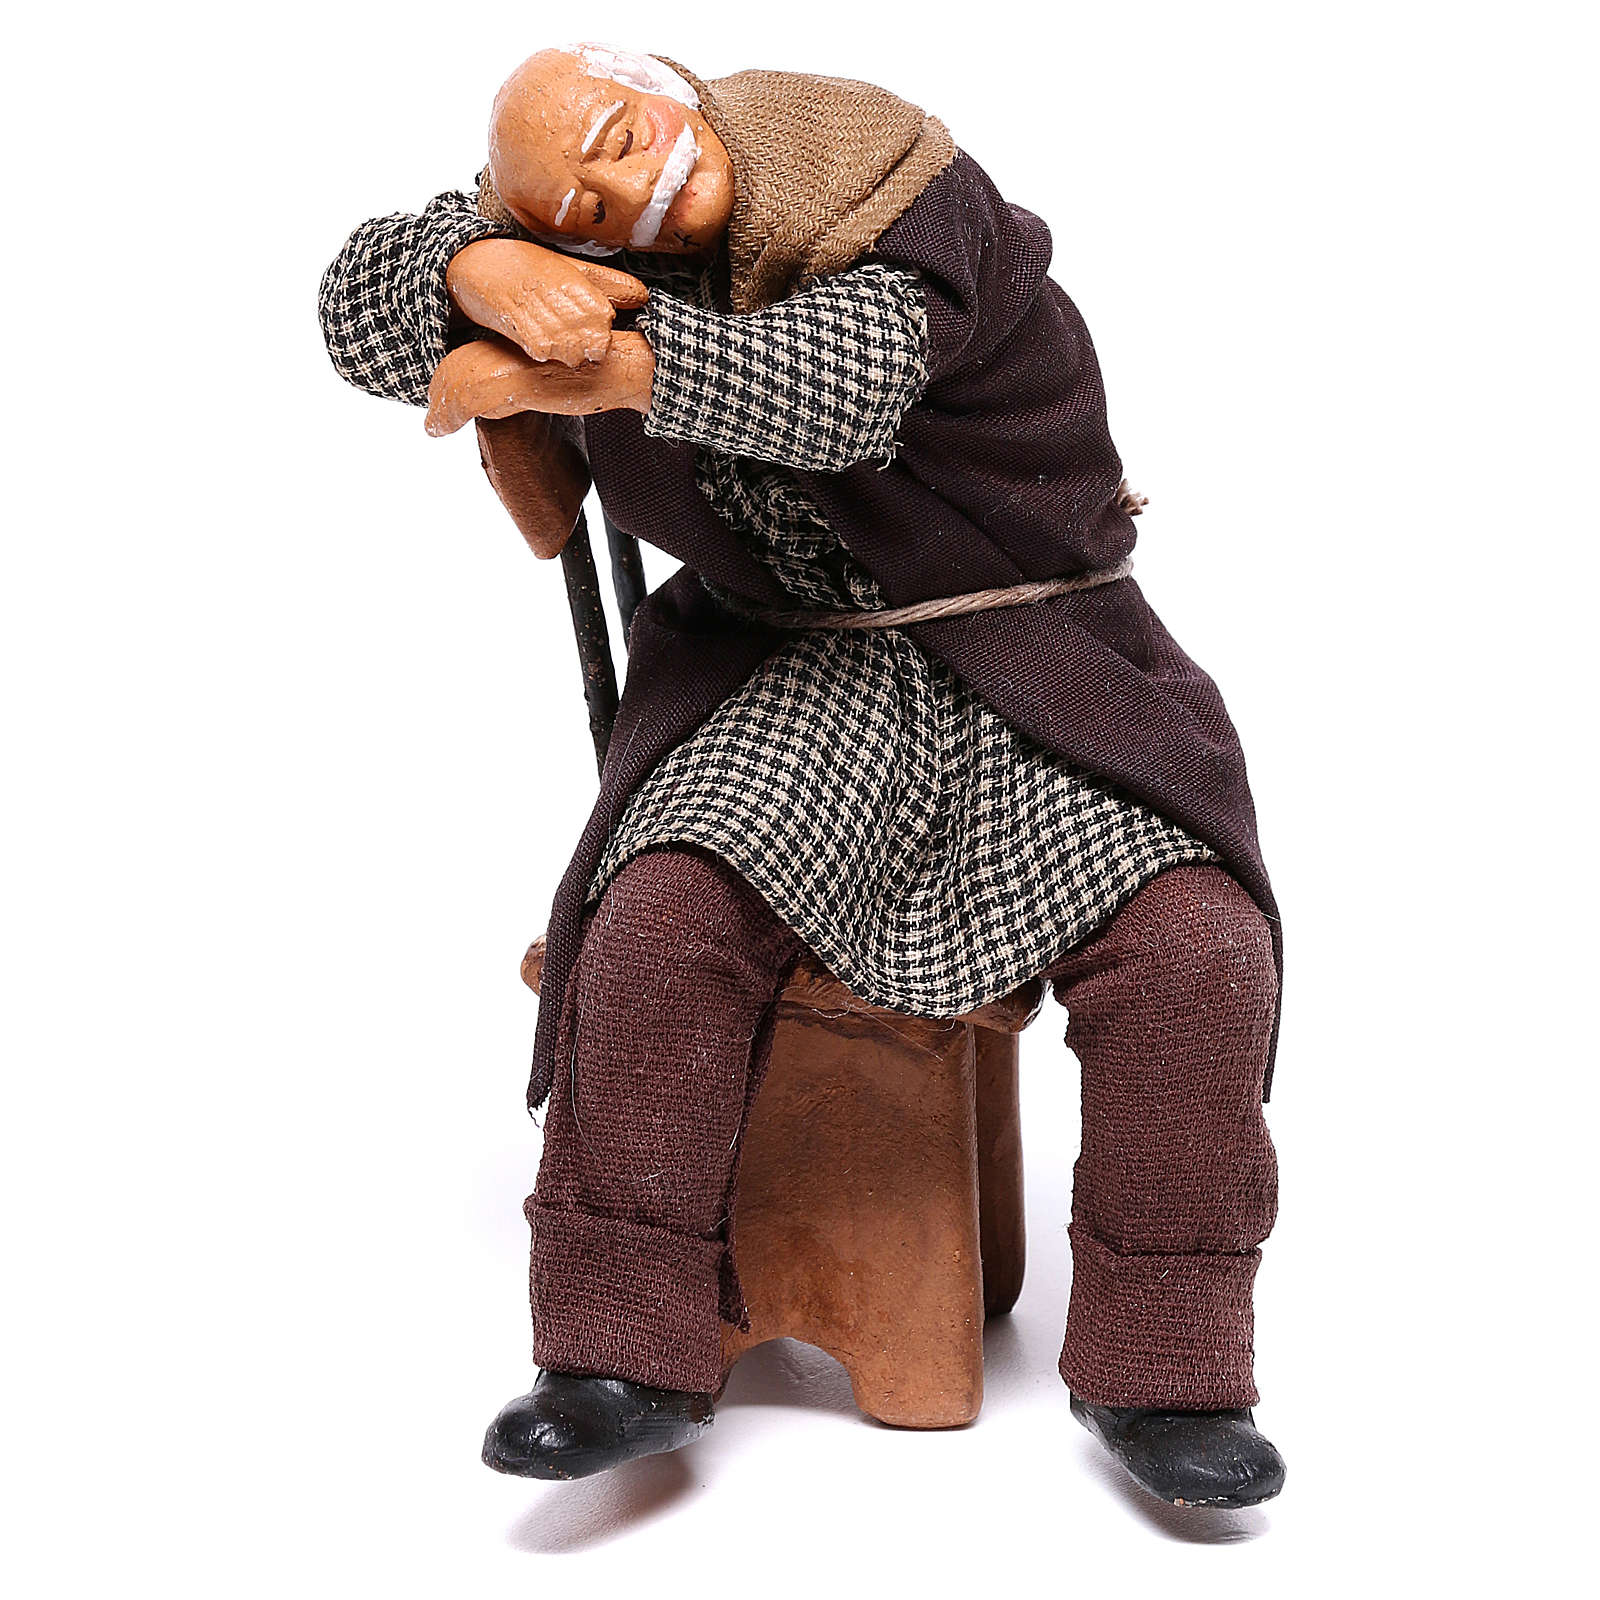 Drunkard sleeping on chair, Neapolitan Nativity 12cm 4